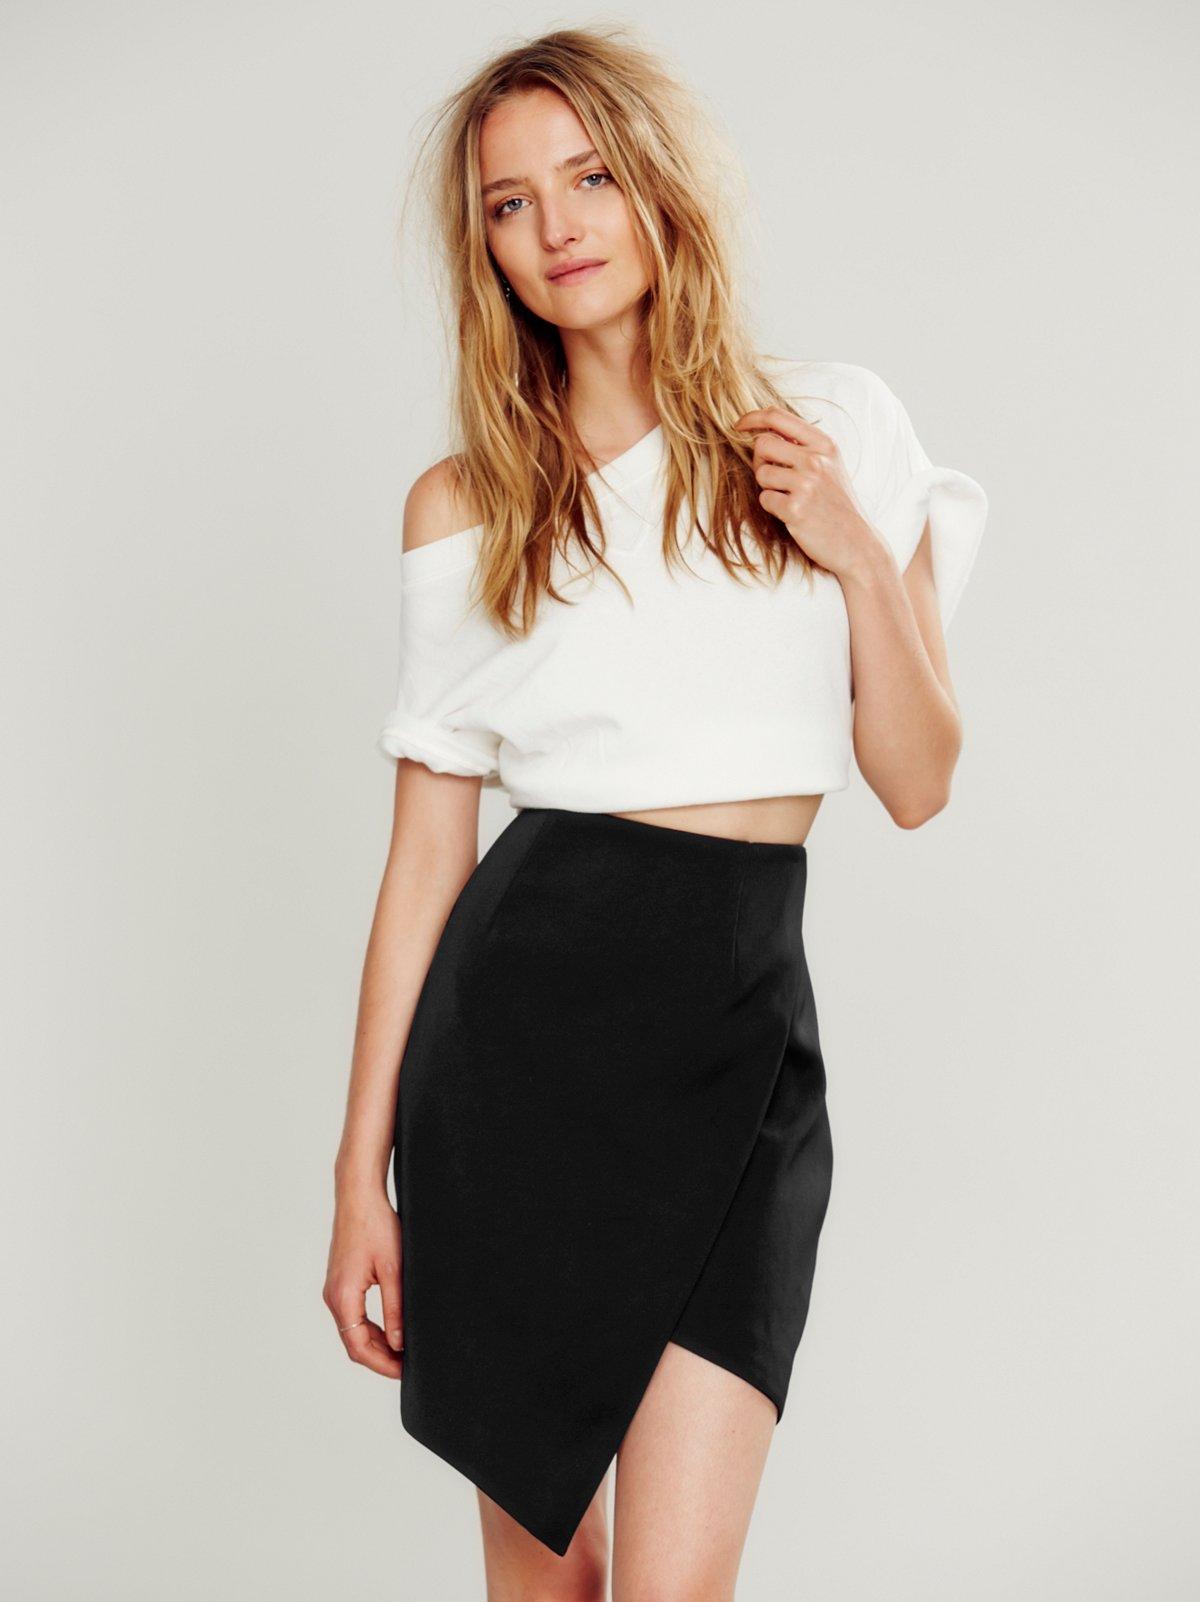 Up All Night Skirt